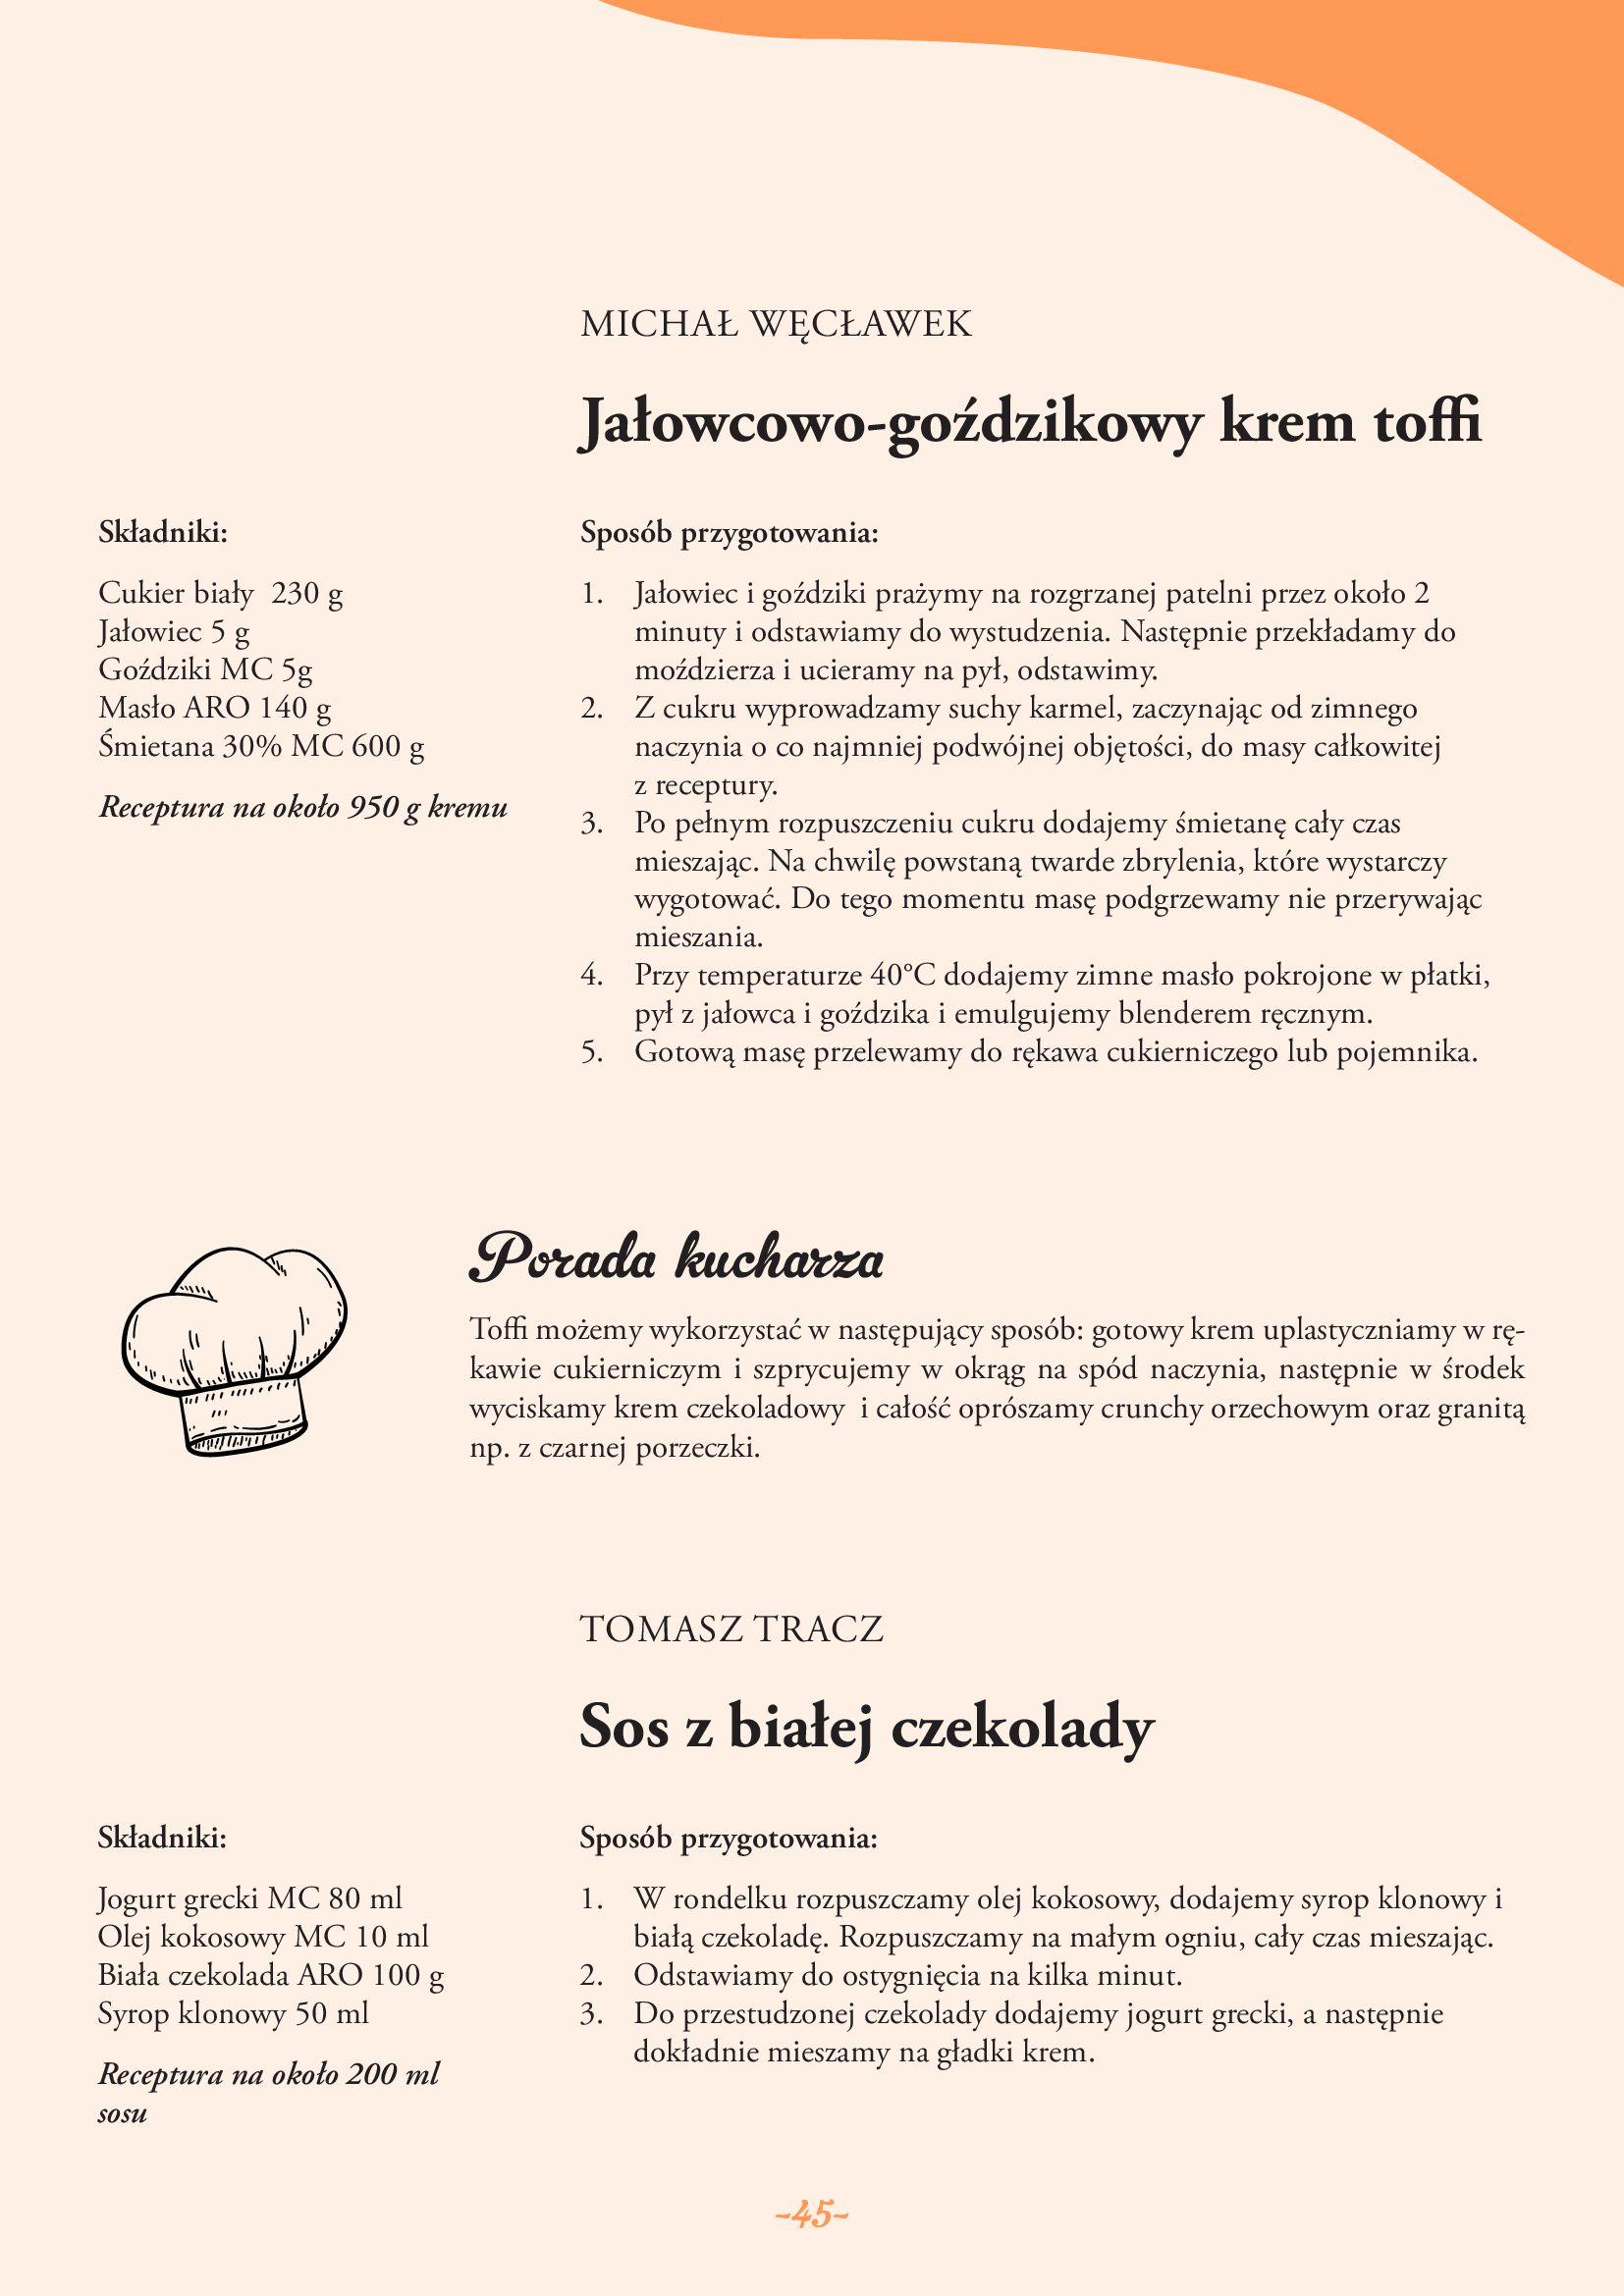 Gazetka Makro: Gazetka Makro - lody i desery 2021-05-21 page-45